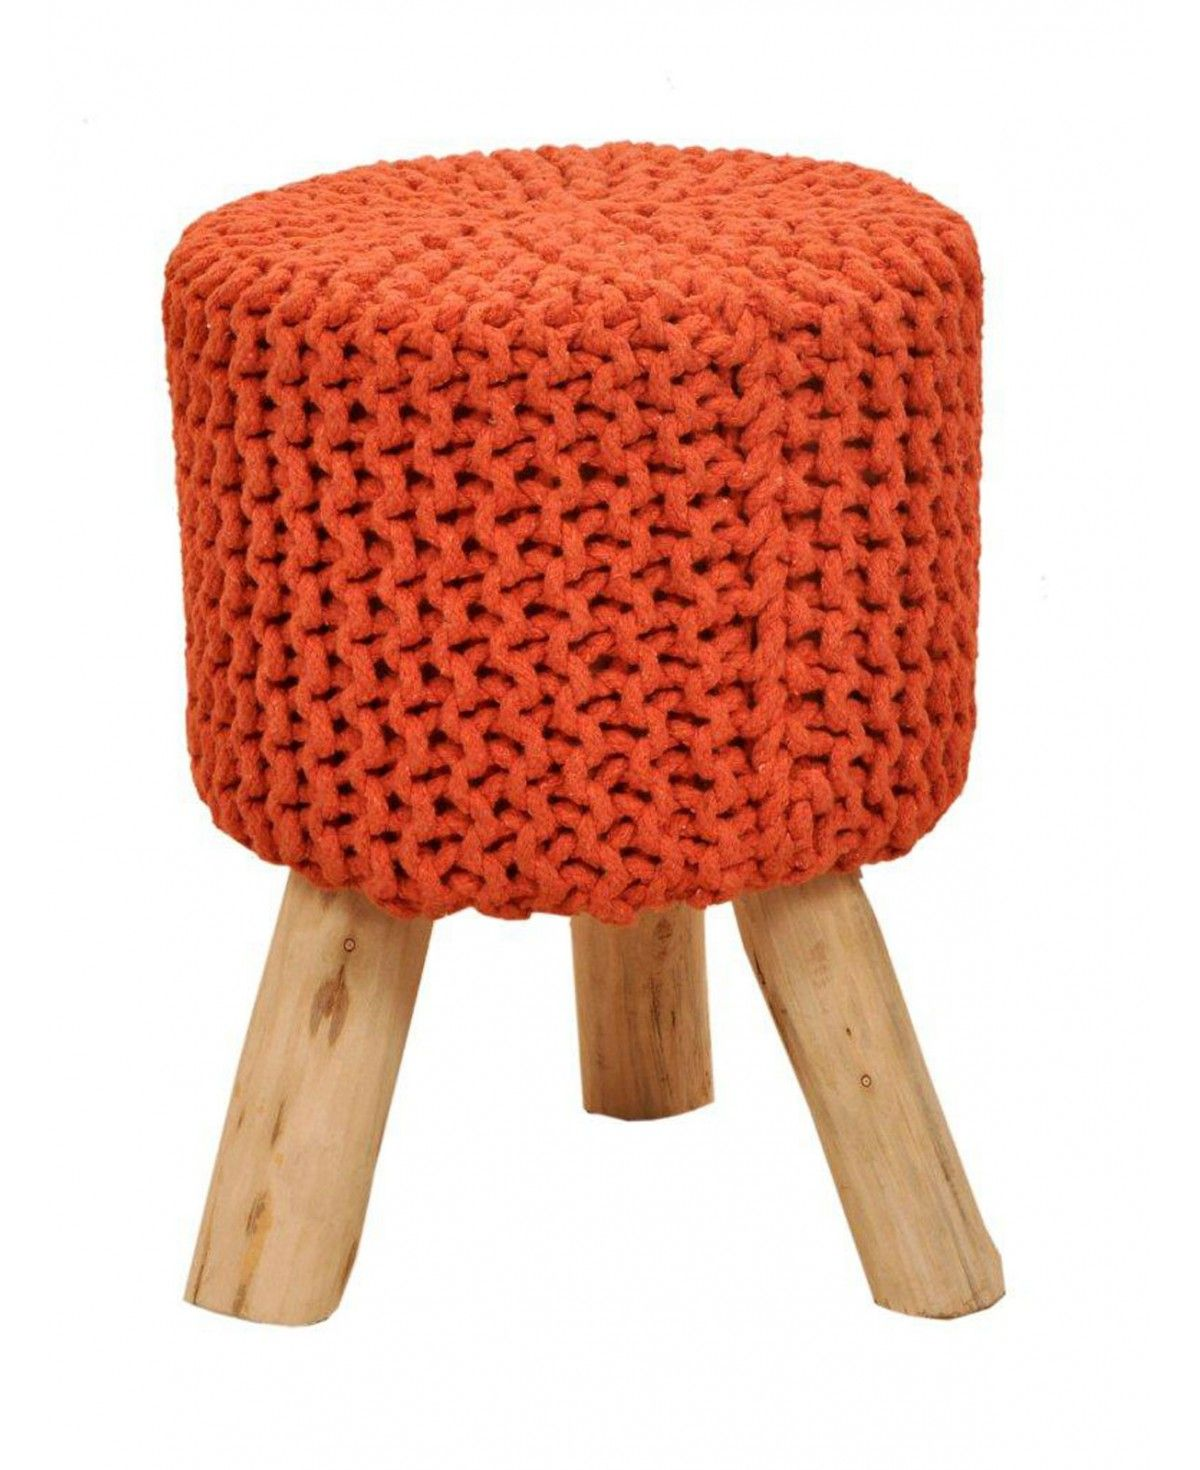 Sitzhocker Pouf Schemel Strickhocker 45 Cm Terracotta